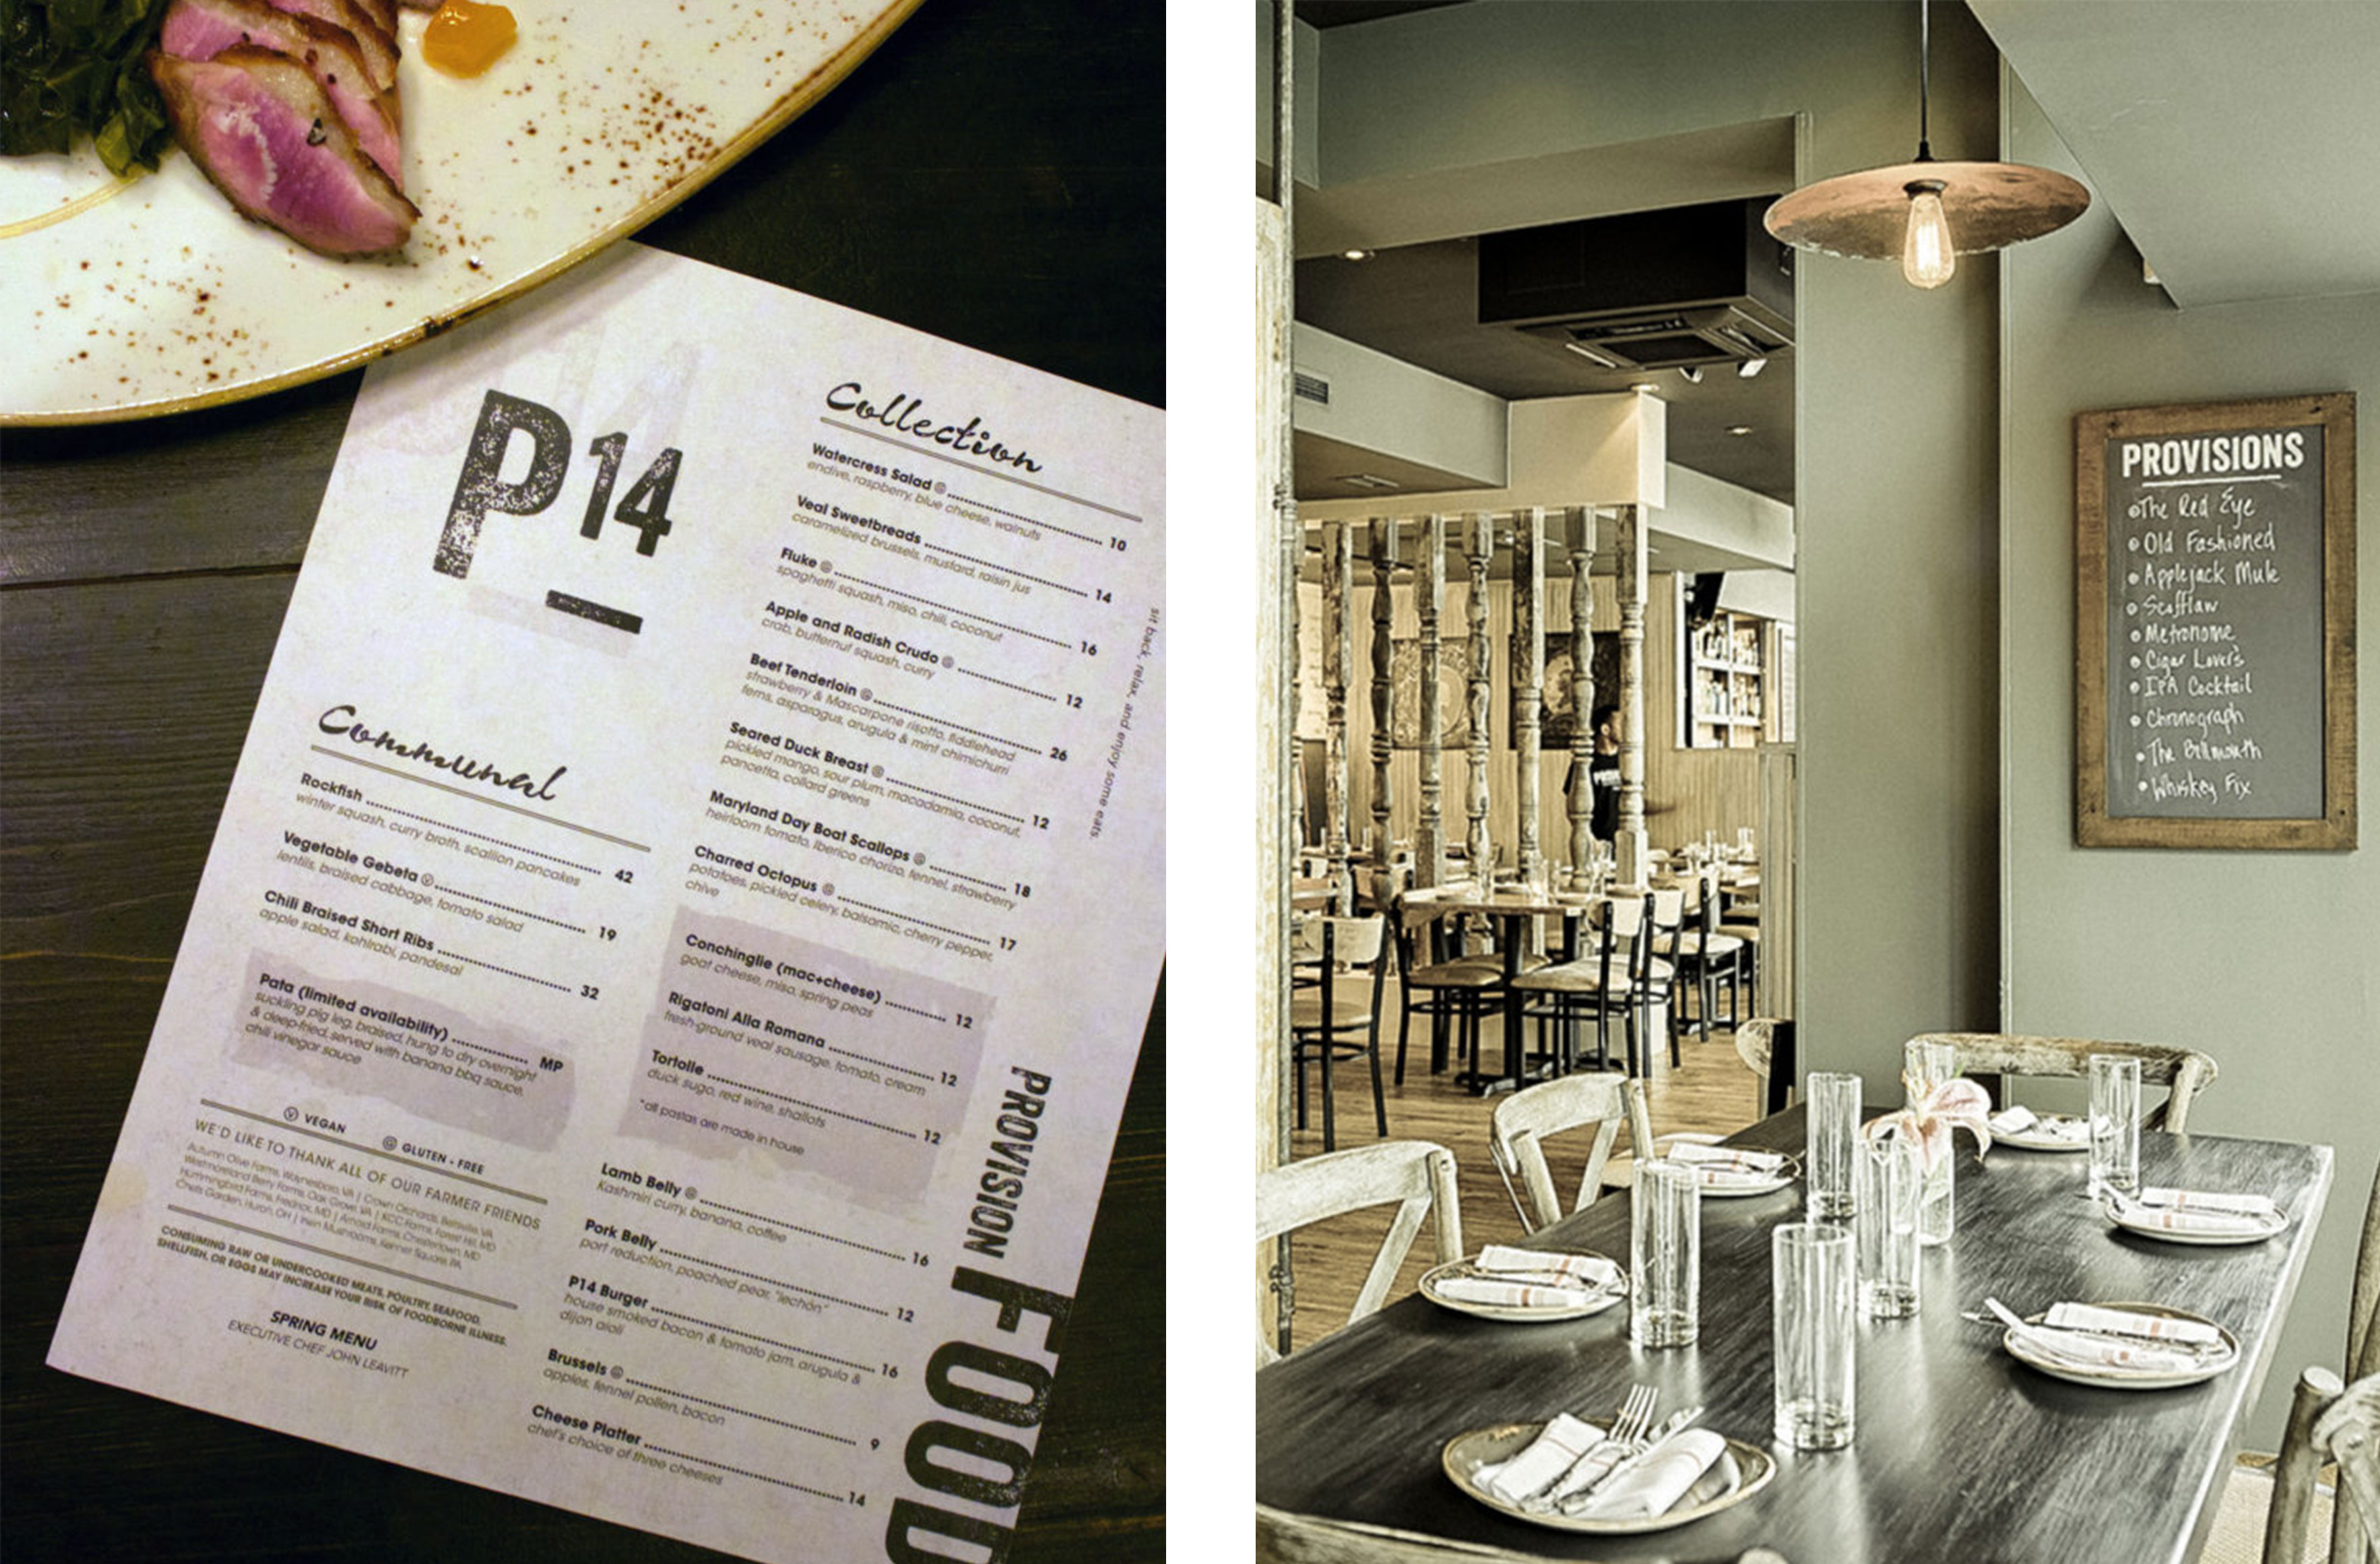 provisions interior and menu